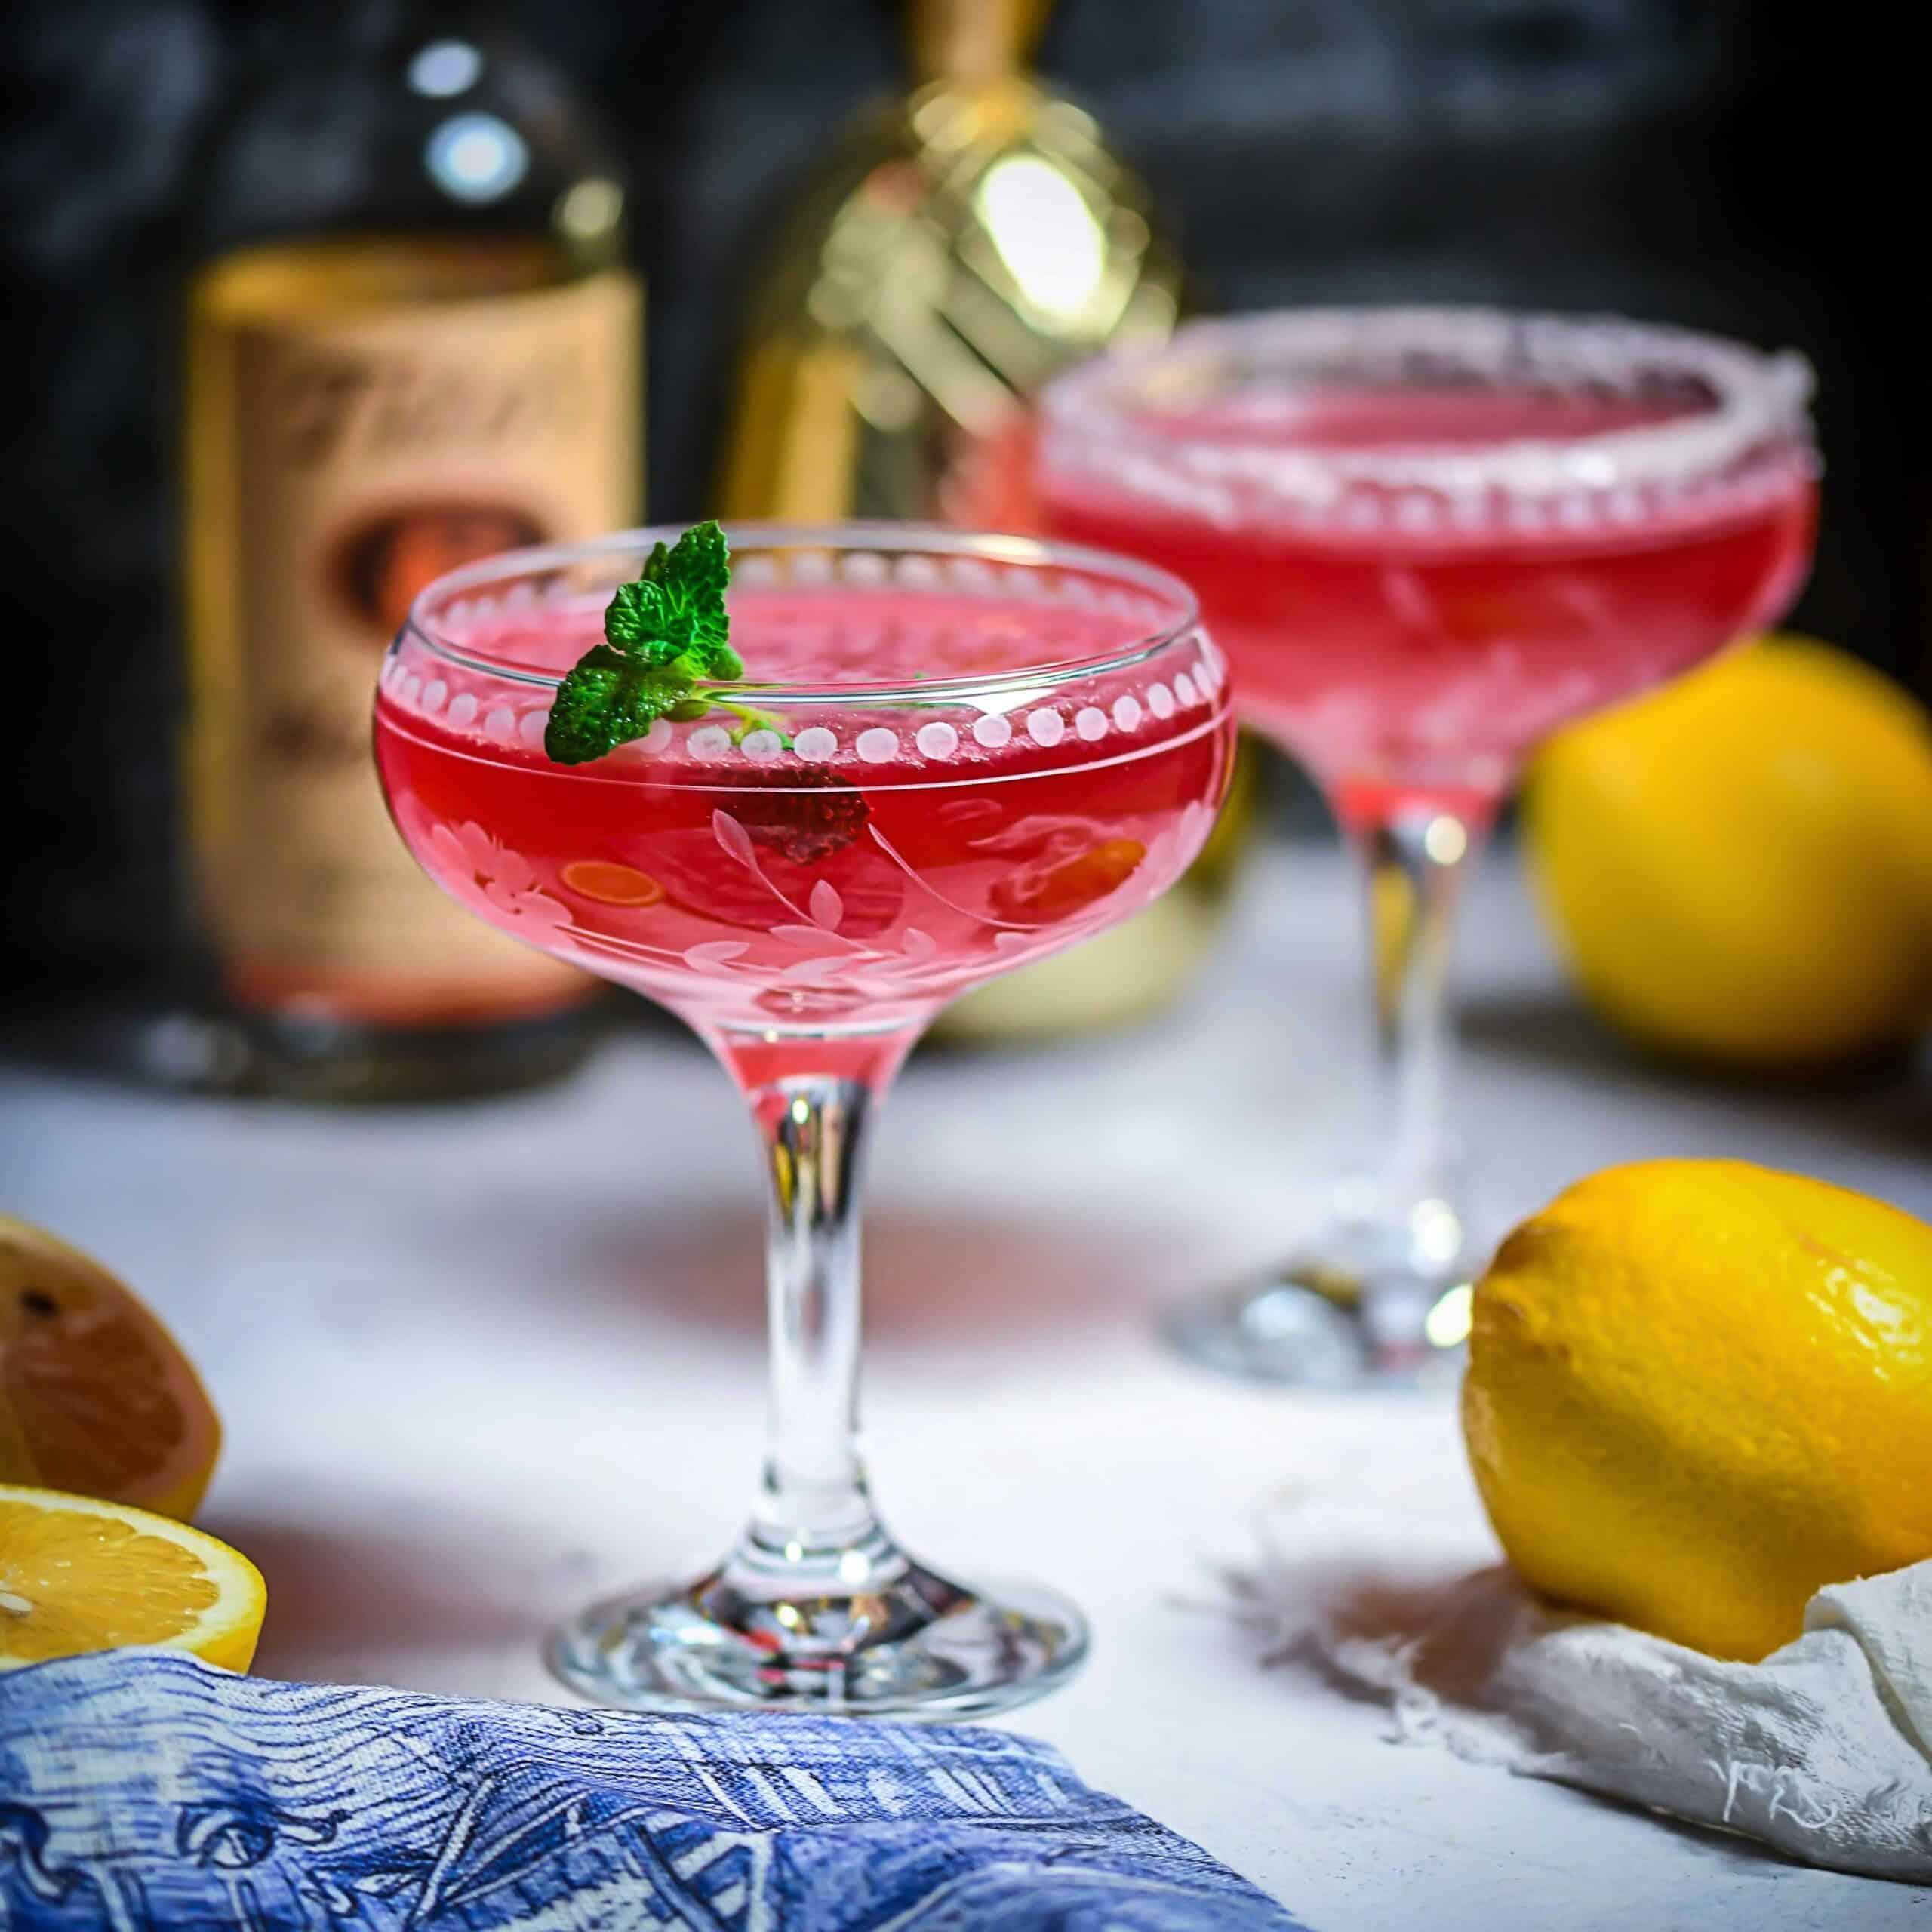 Cran-Citrus Fizz Honey Cocktail